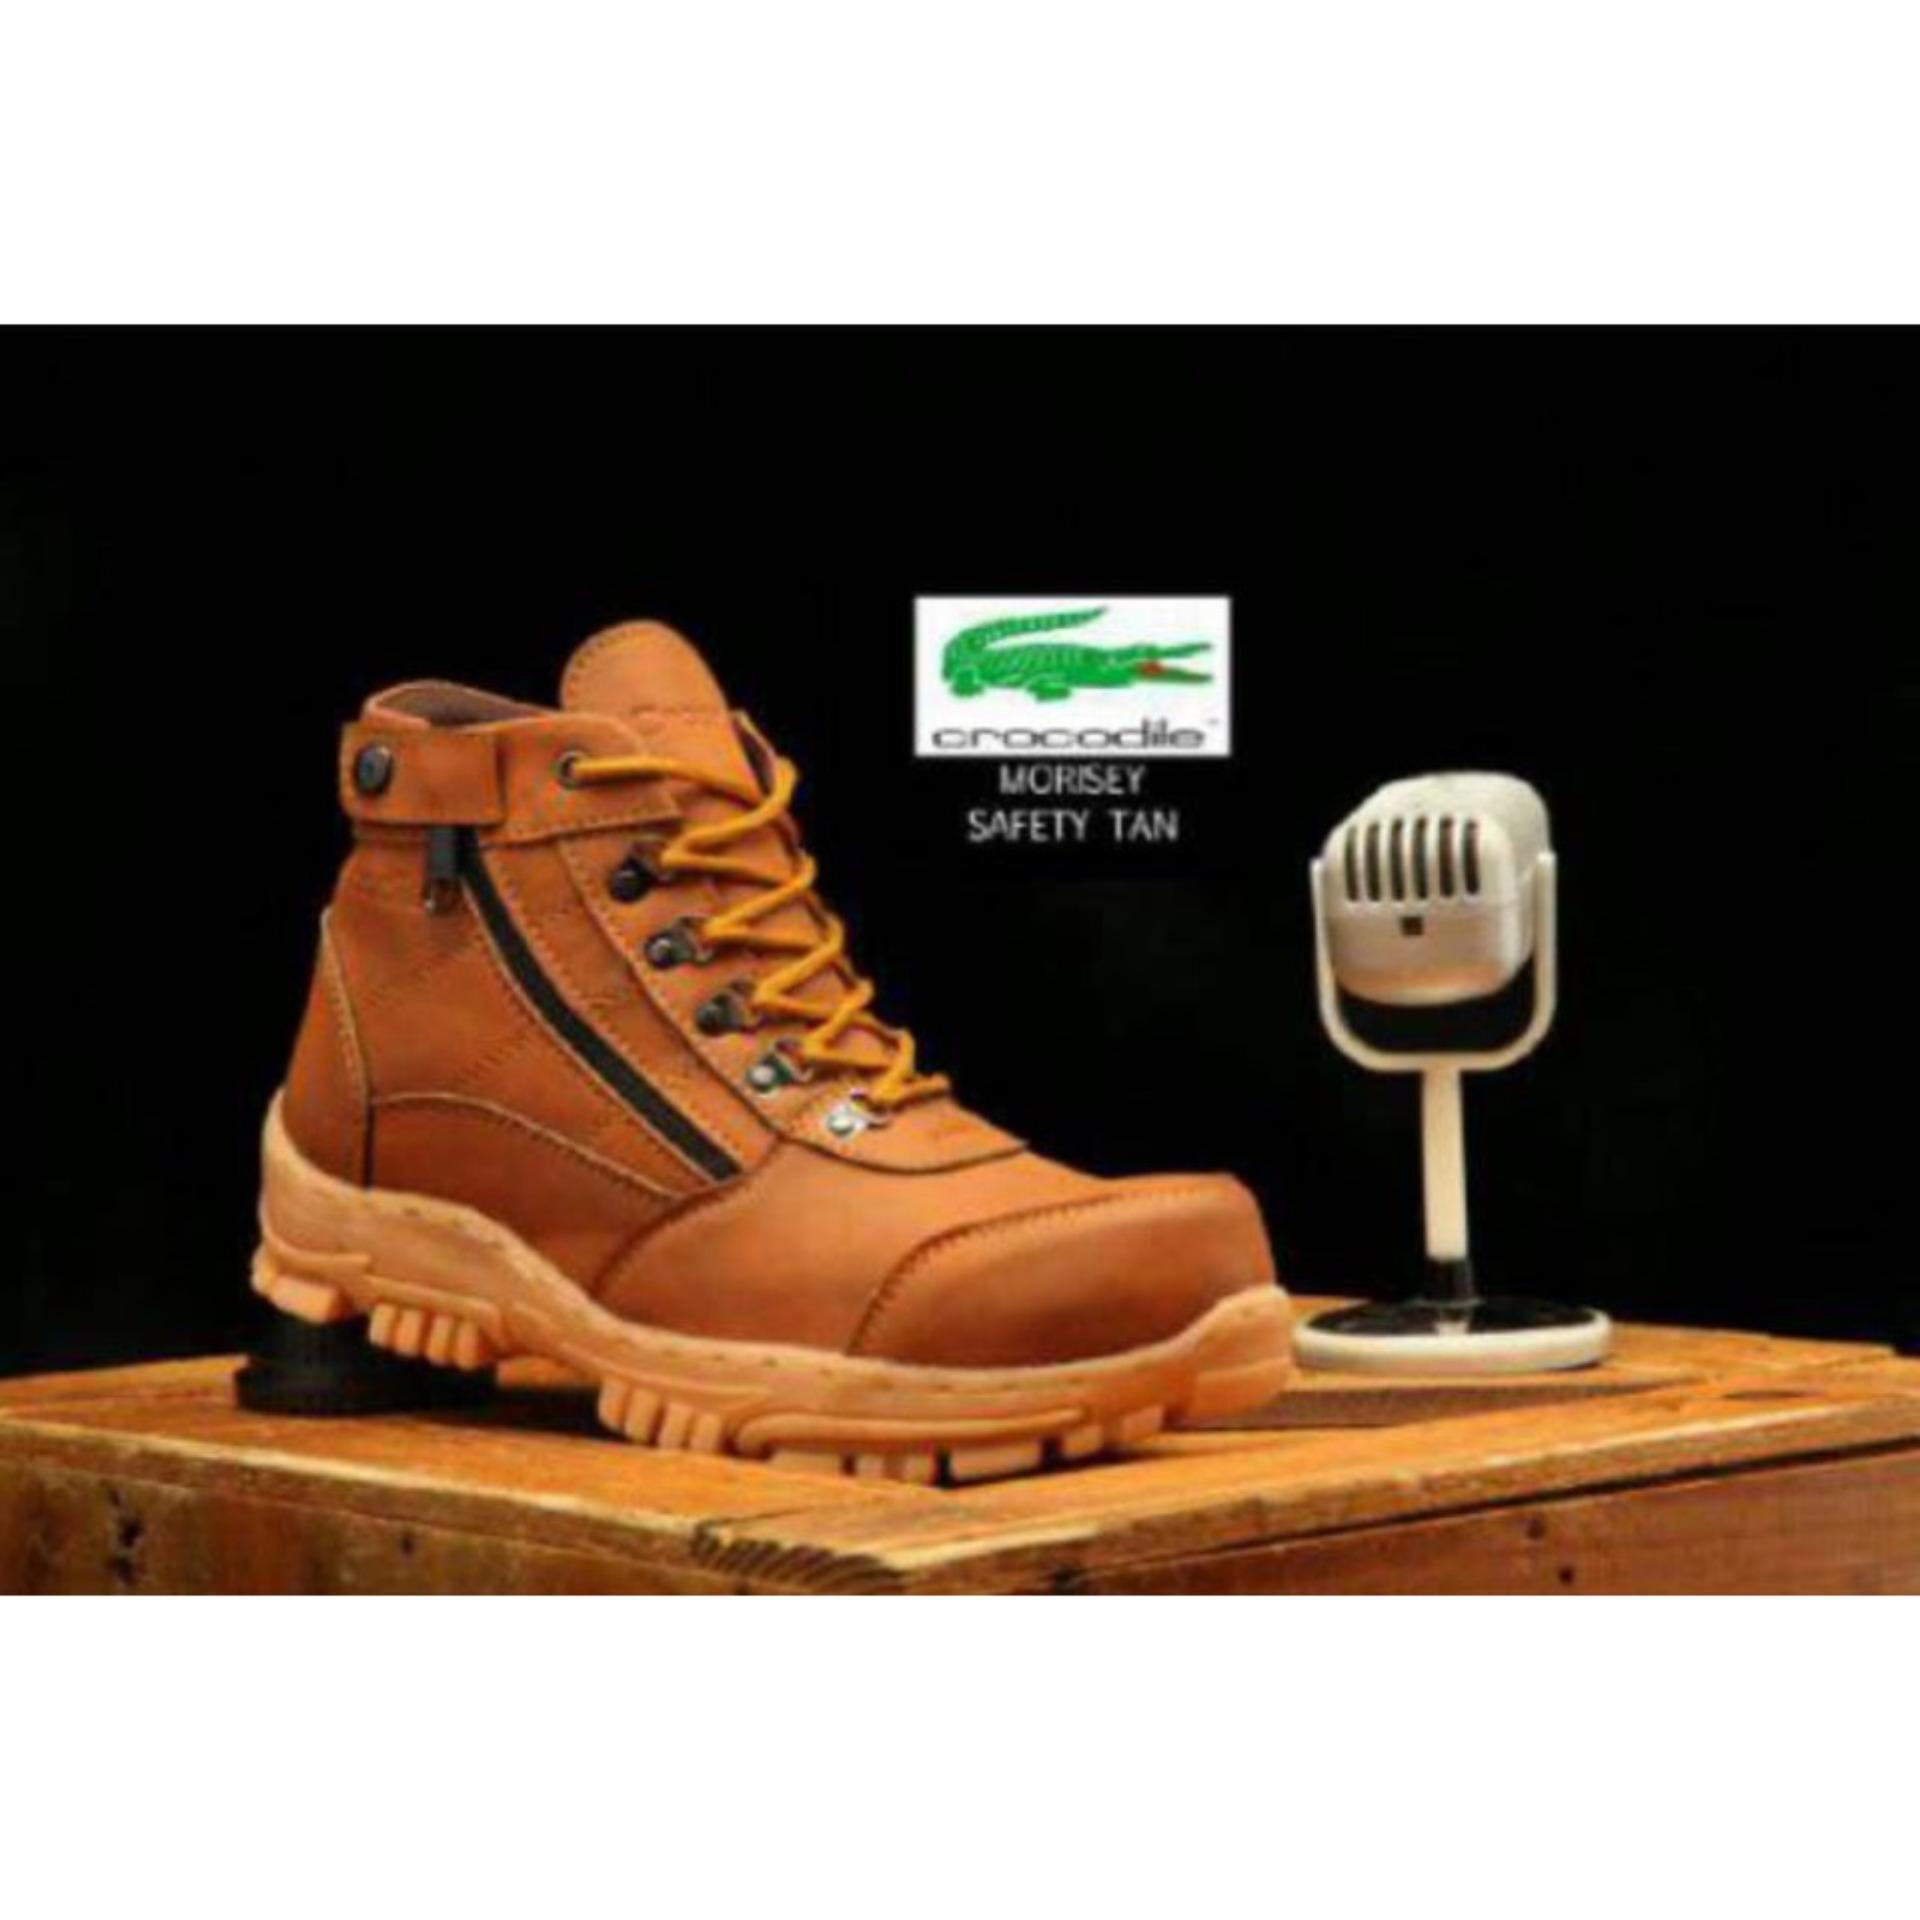 Jual Sepatu Pria Boots Safety Crocodile Safety Boots Hitam Tan Jawa Barat